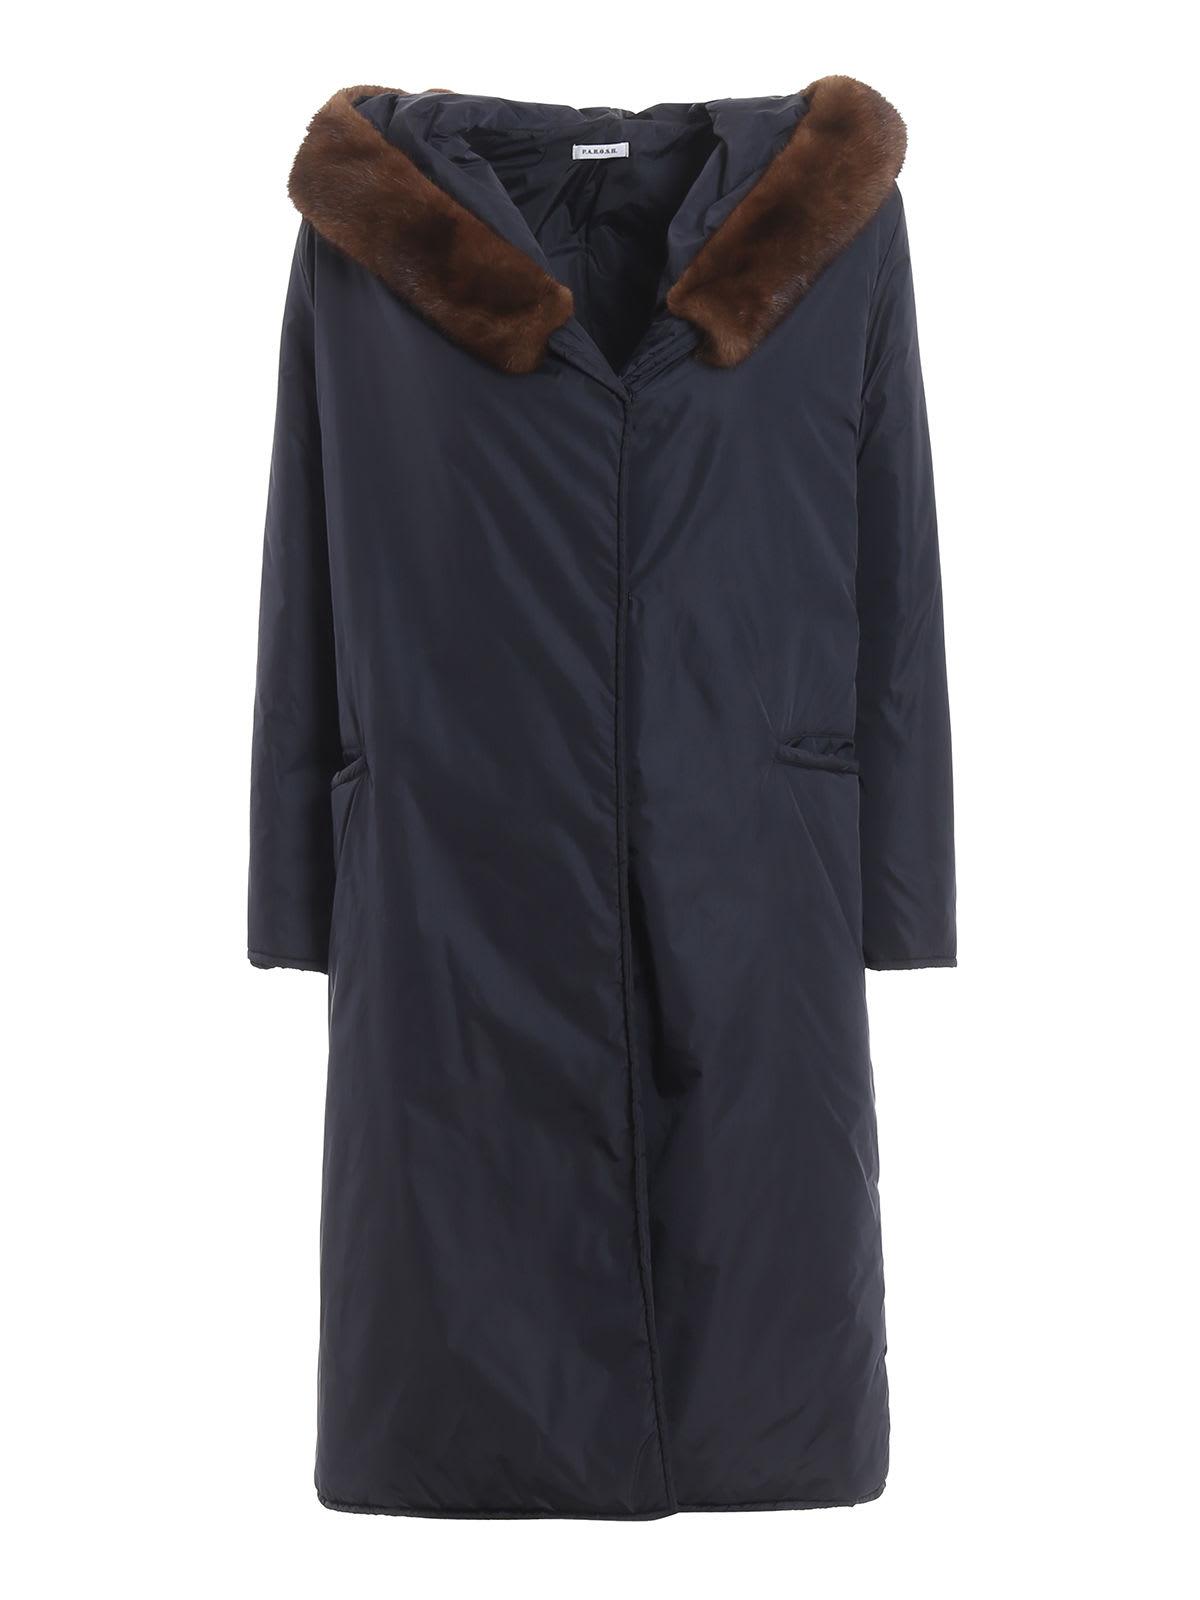 Parosh Raincoat With Mink